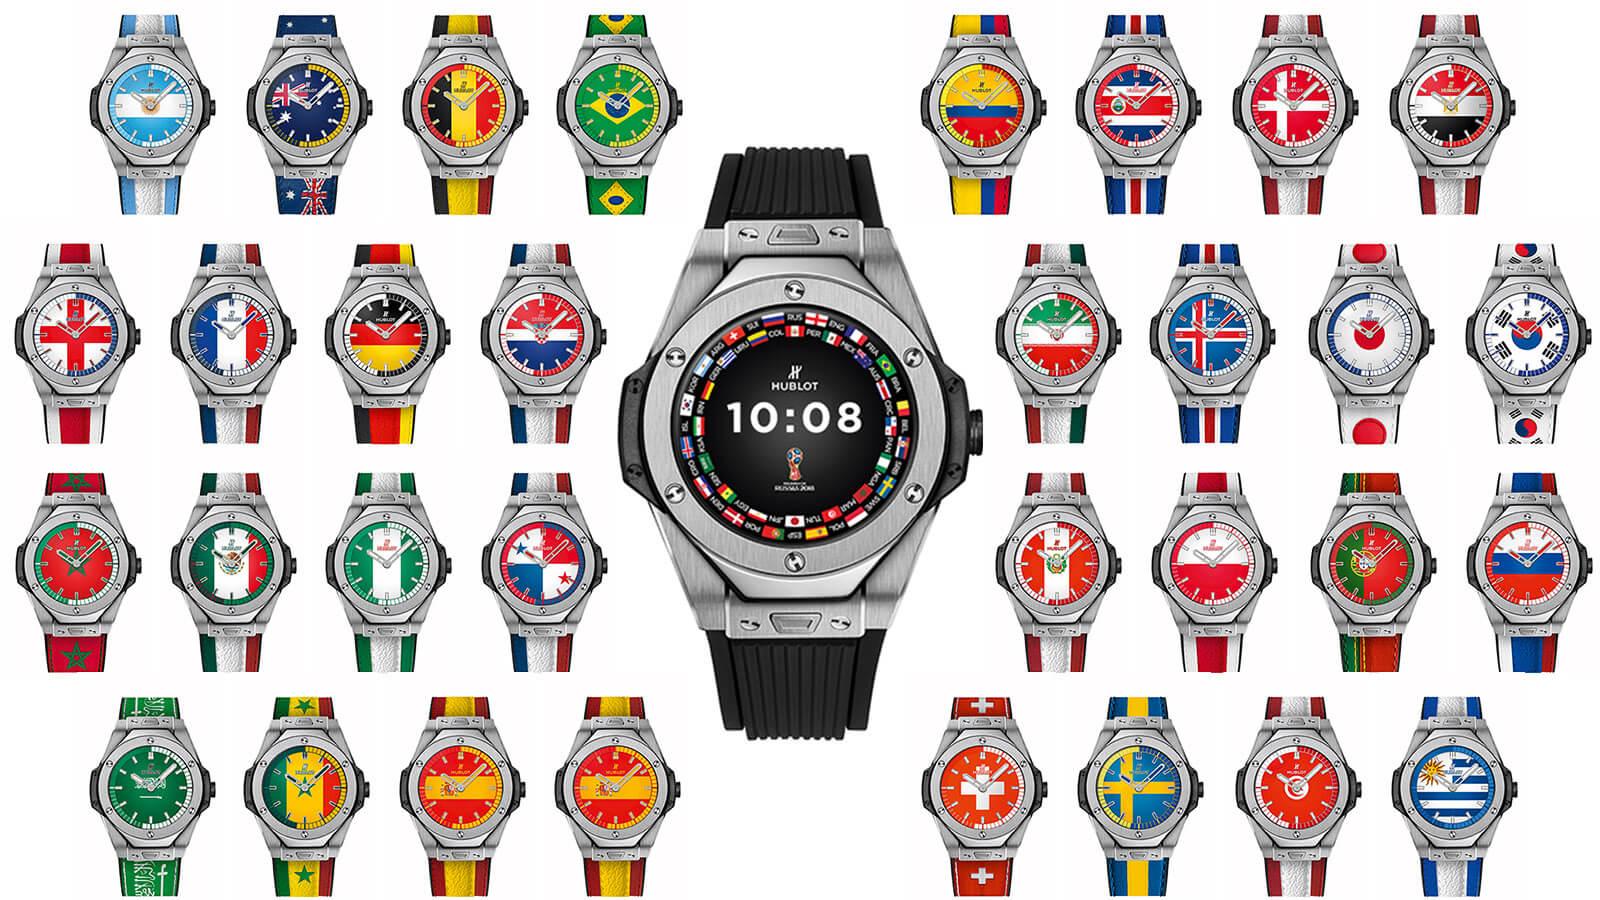 C罗梅西年收入上亿,扒一扒这些世界顶级球星都戴什么表?